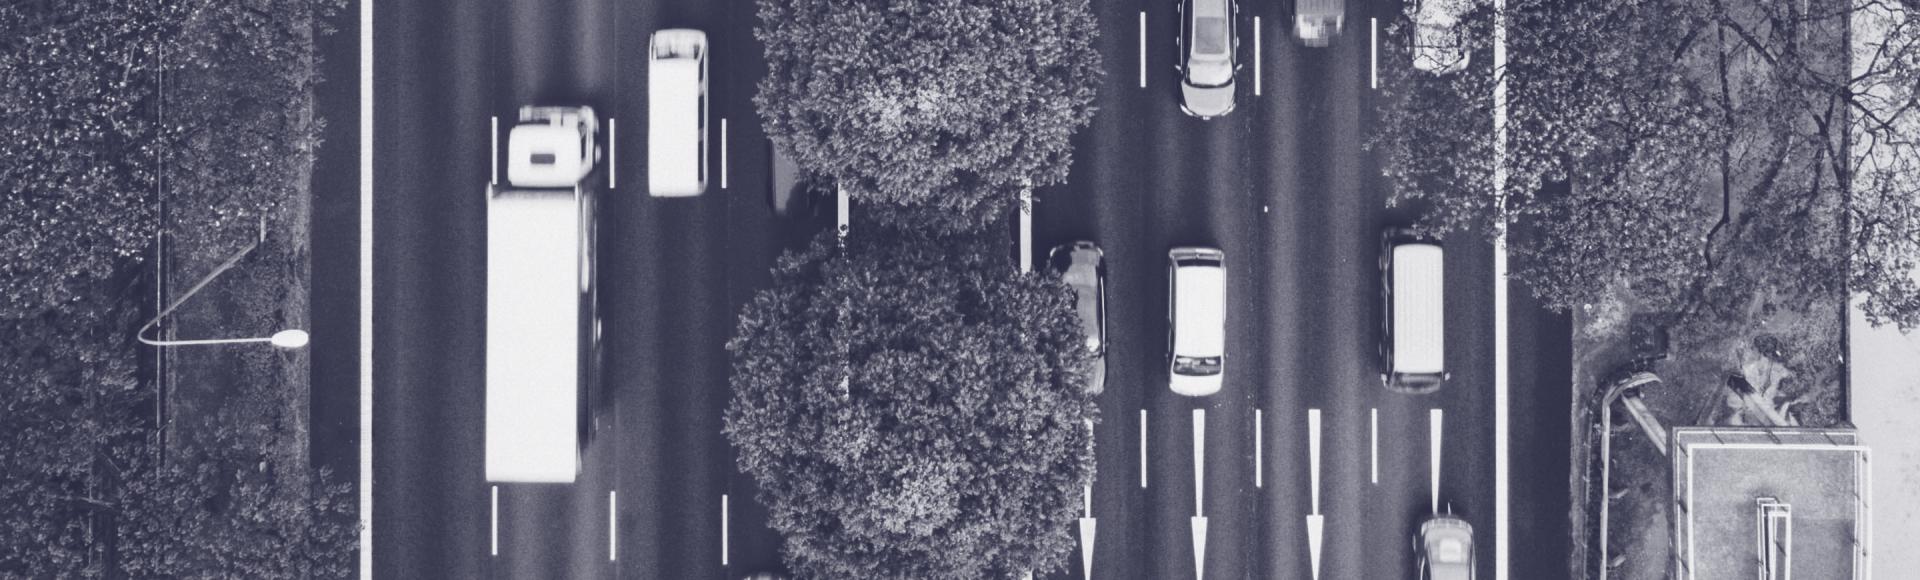 ARK-Invest_Blog-Banner_2016_09_15---Shared-Autonomous-Vehicles